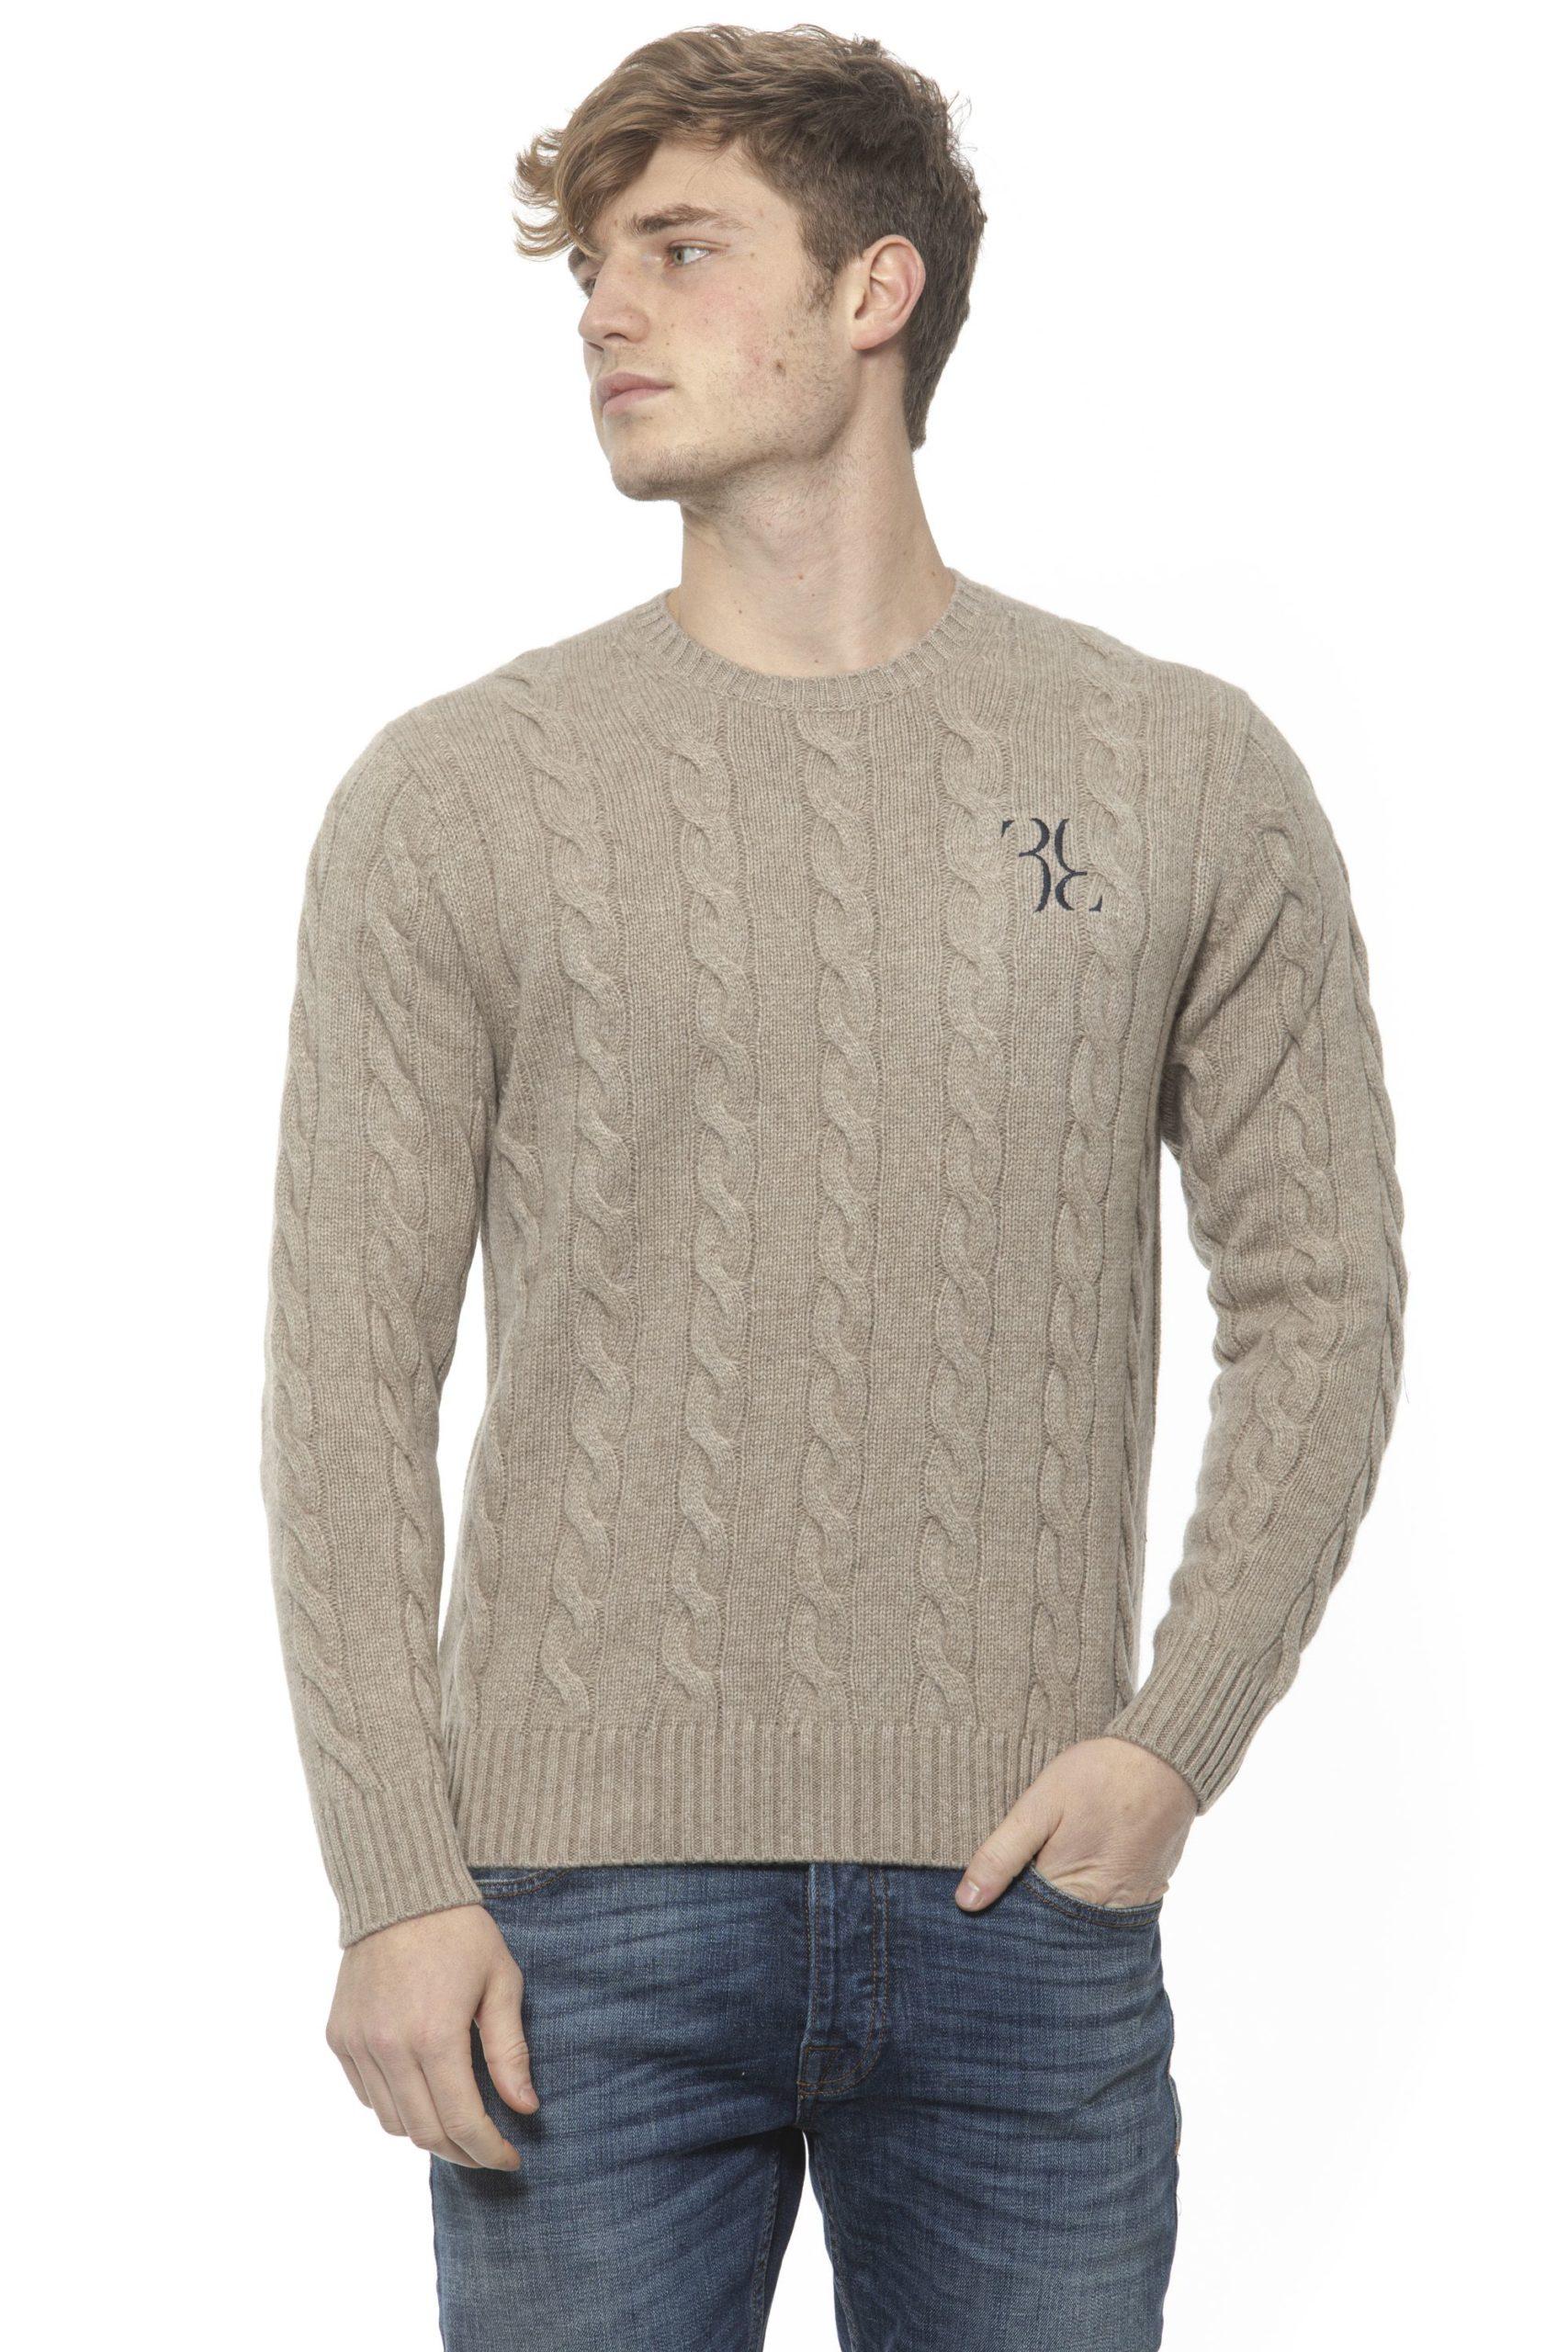 Billionaire Italian Couture Men's Tortora Taupe Sweater Beige BI1313442 - S